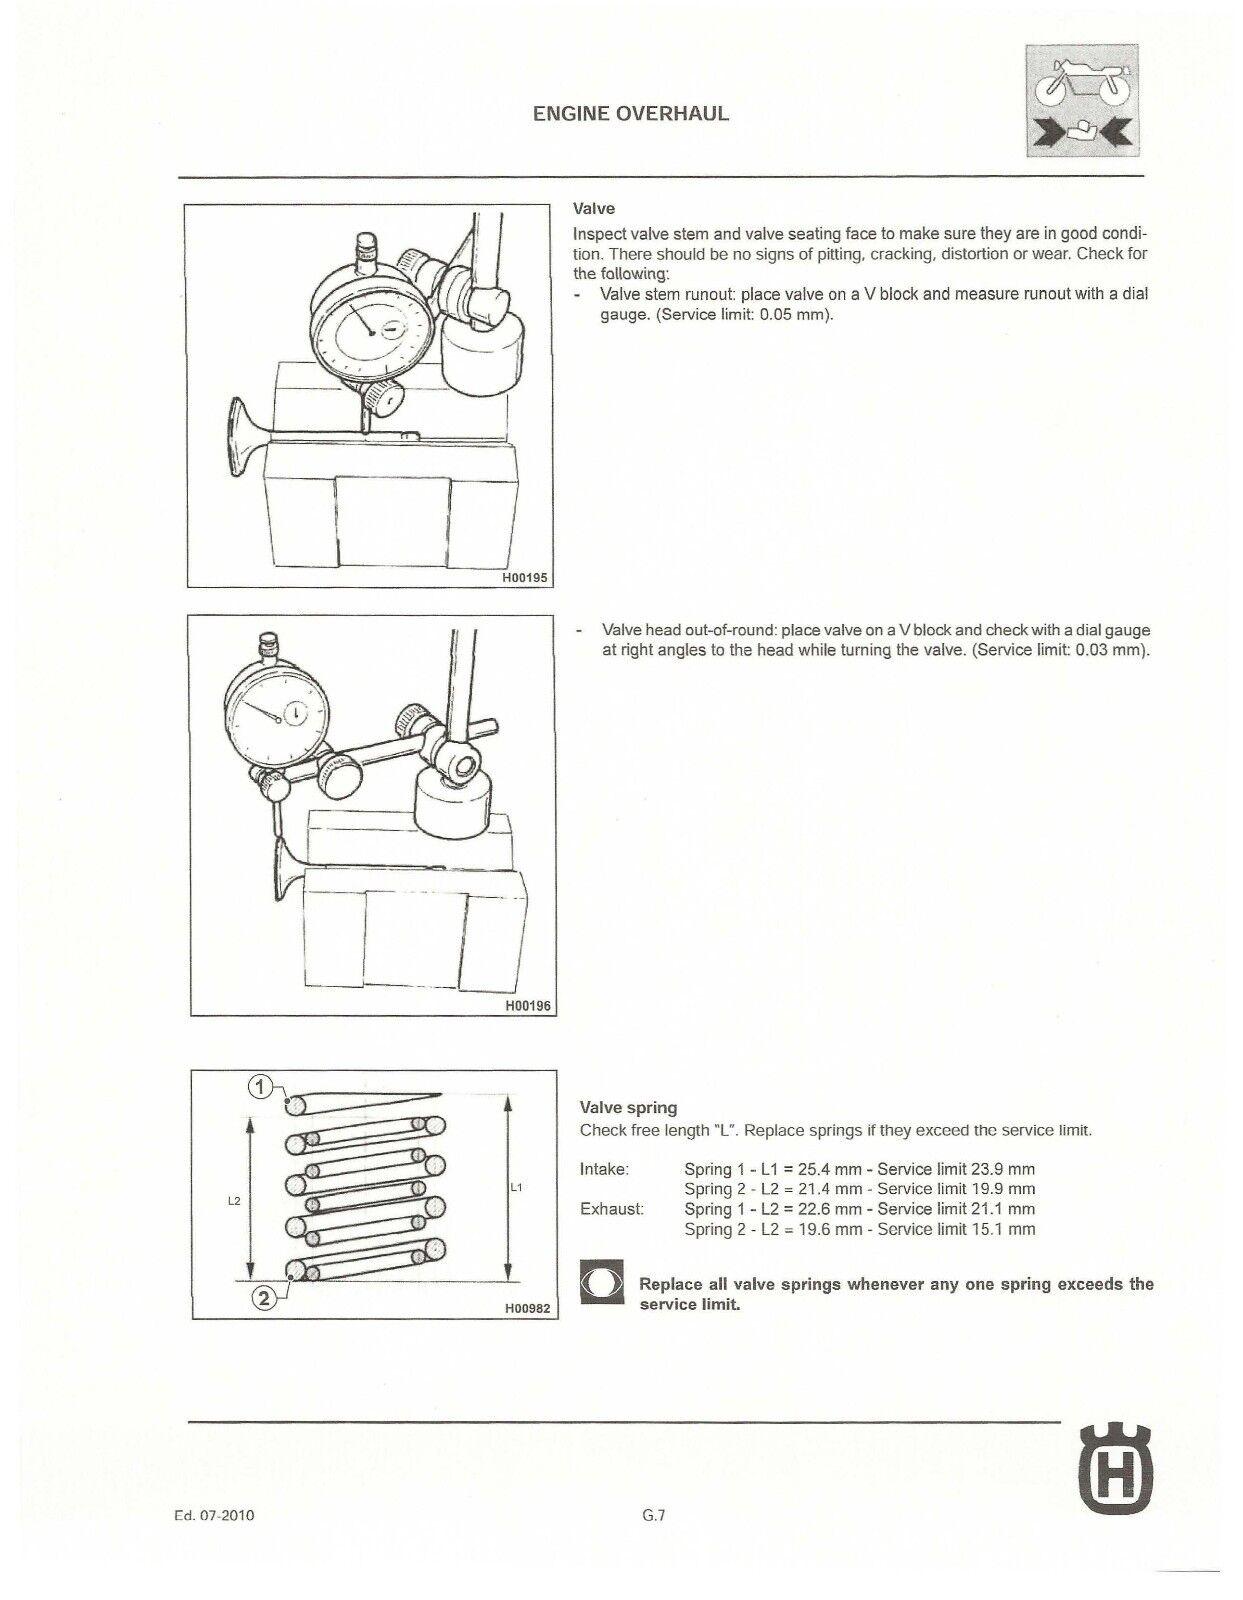 ... workshop service manual 2011 TC 250 7 of 12 Husqvarna ...